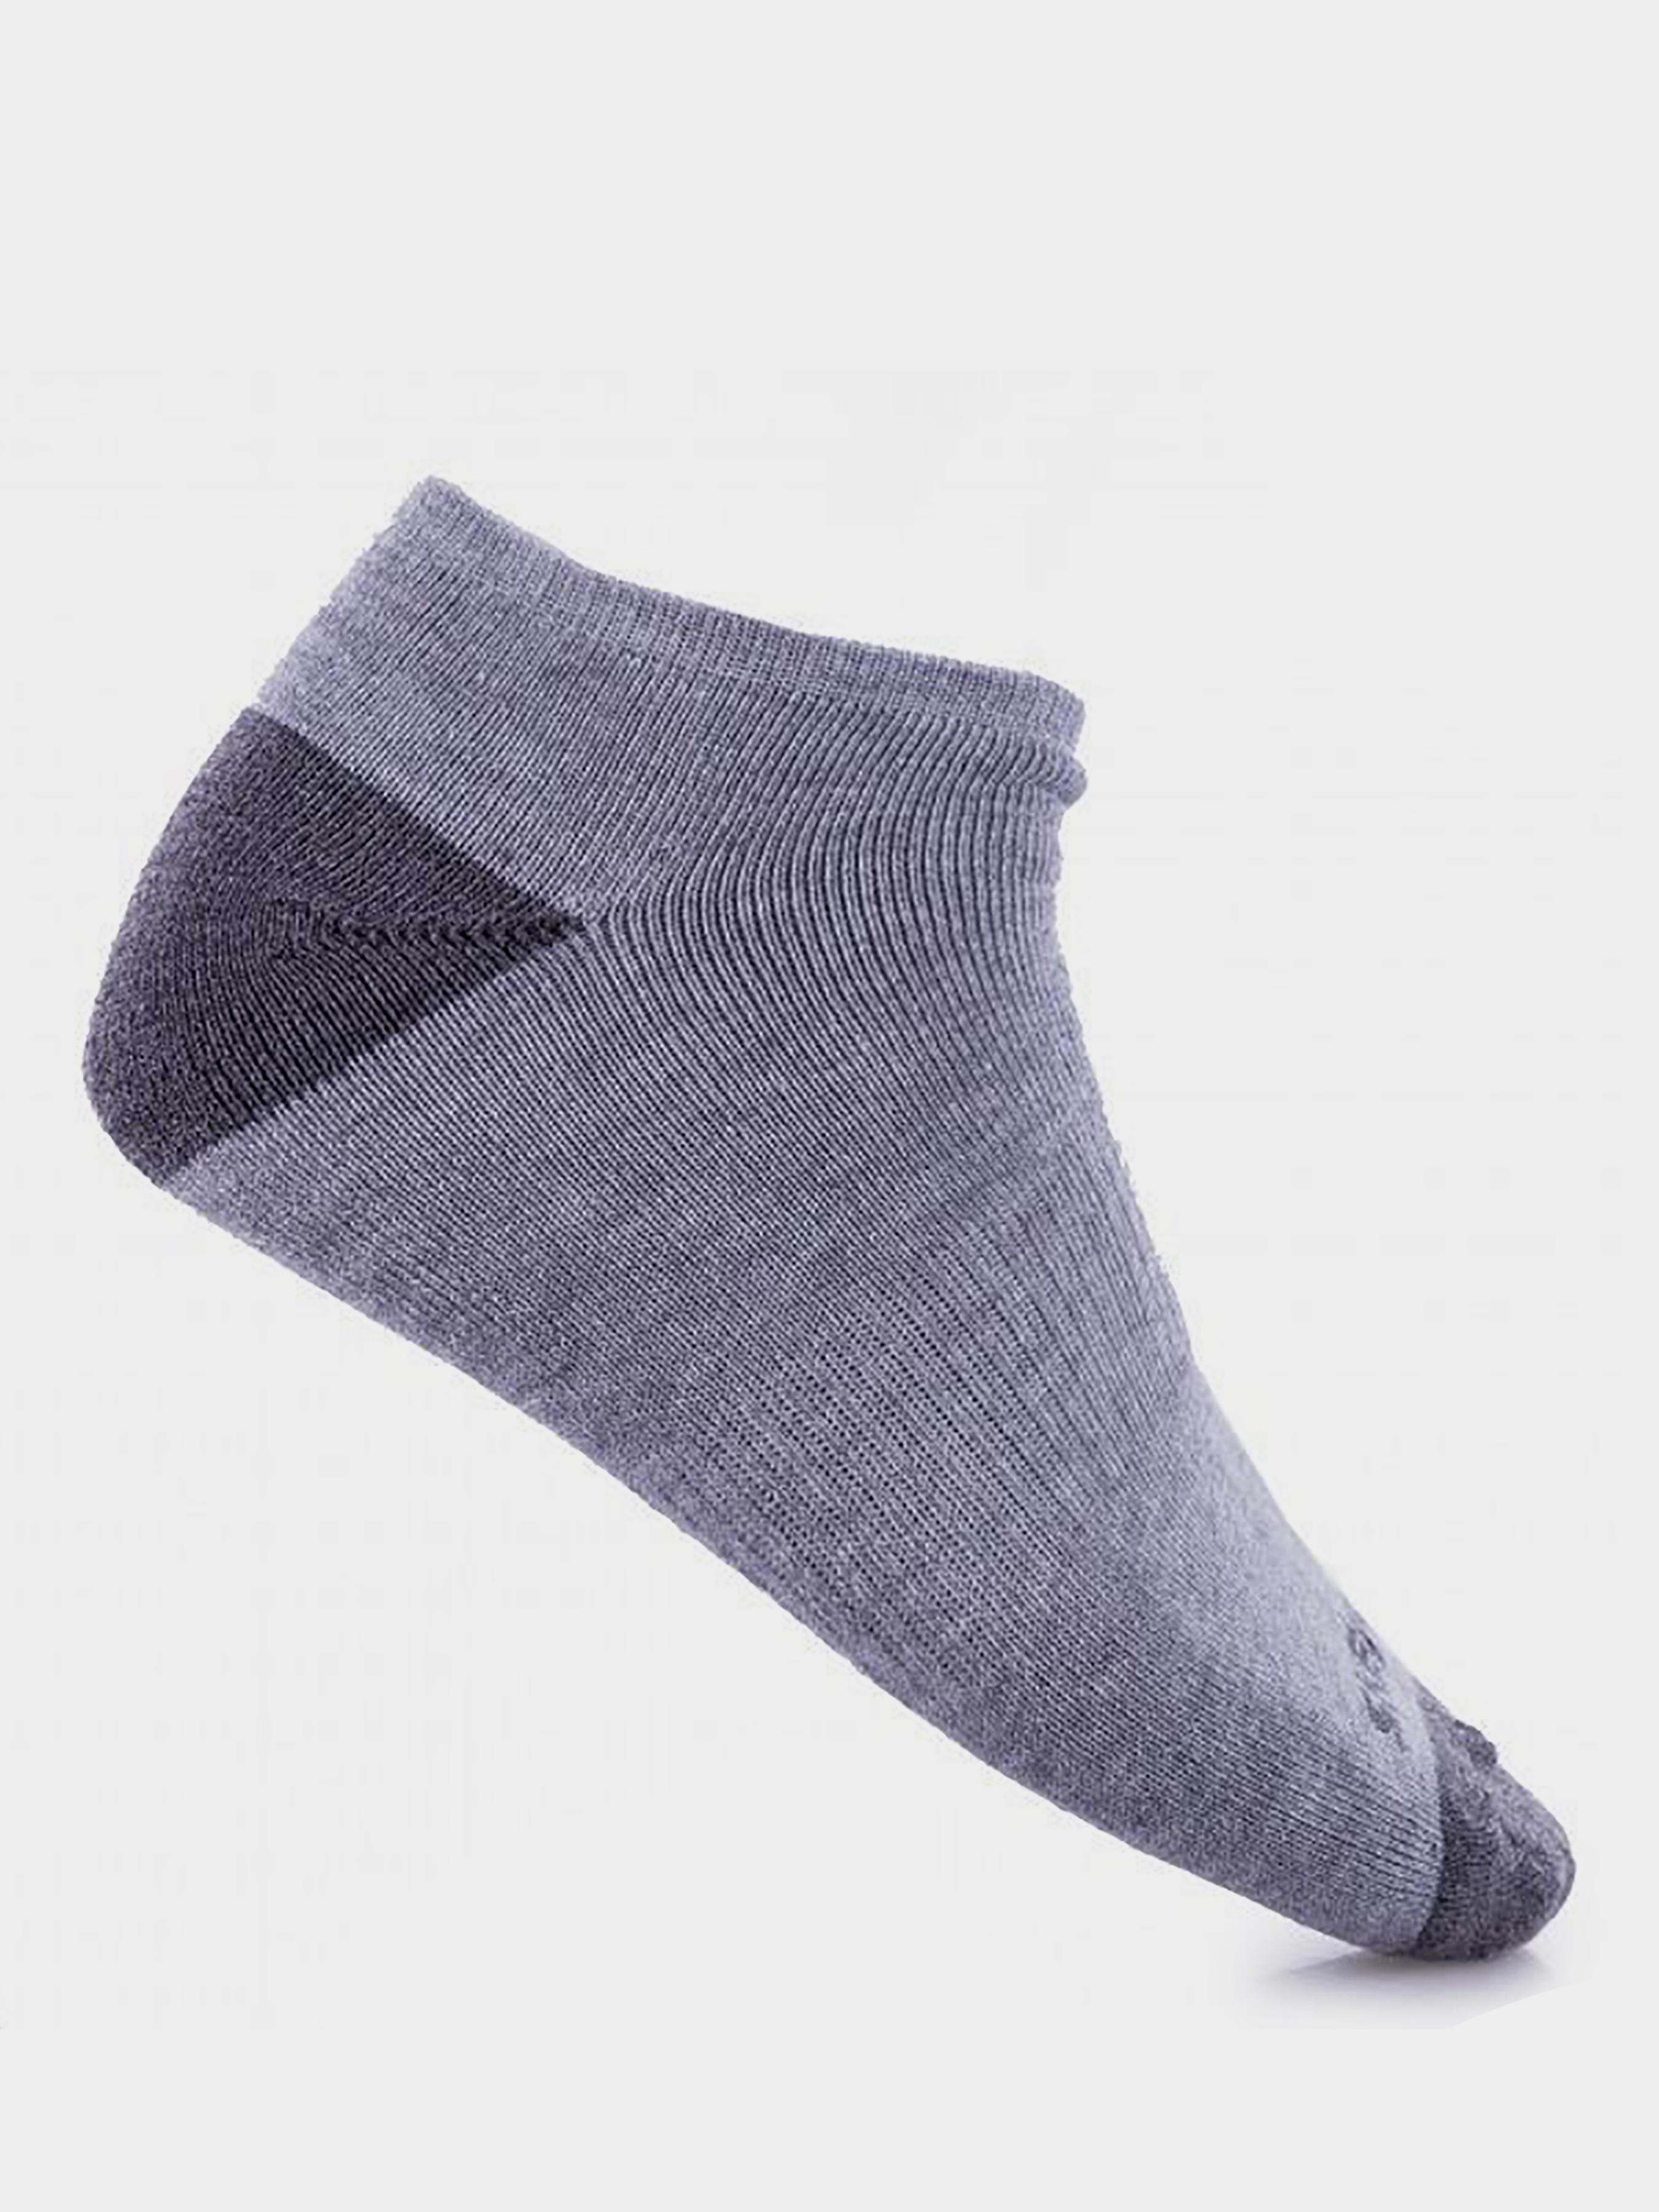 Носки для мужчин Skechers 9C76 размеры одежды, 2017